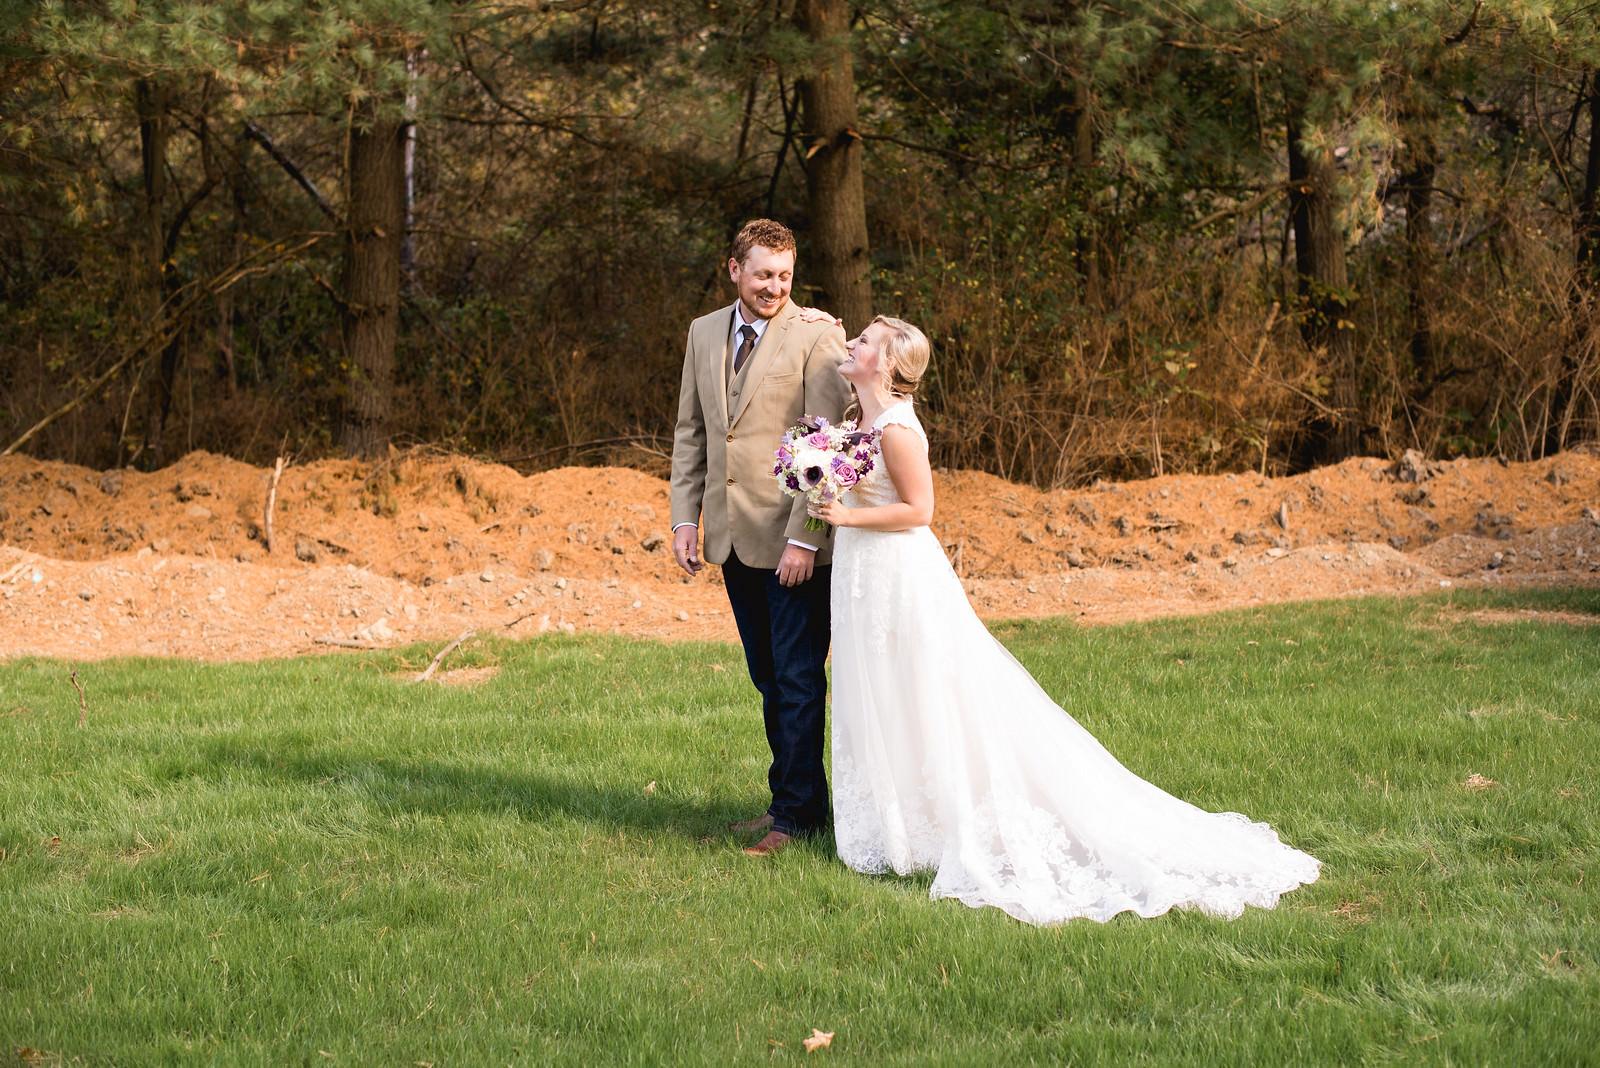 first_look_on_wedding_day3.jpg